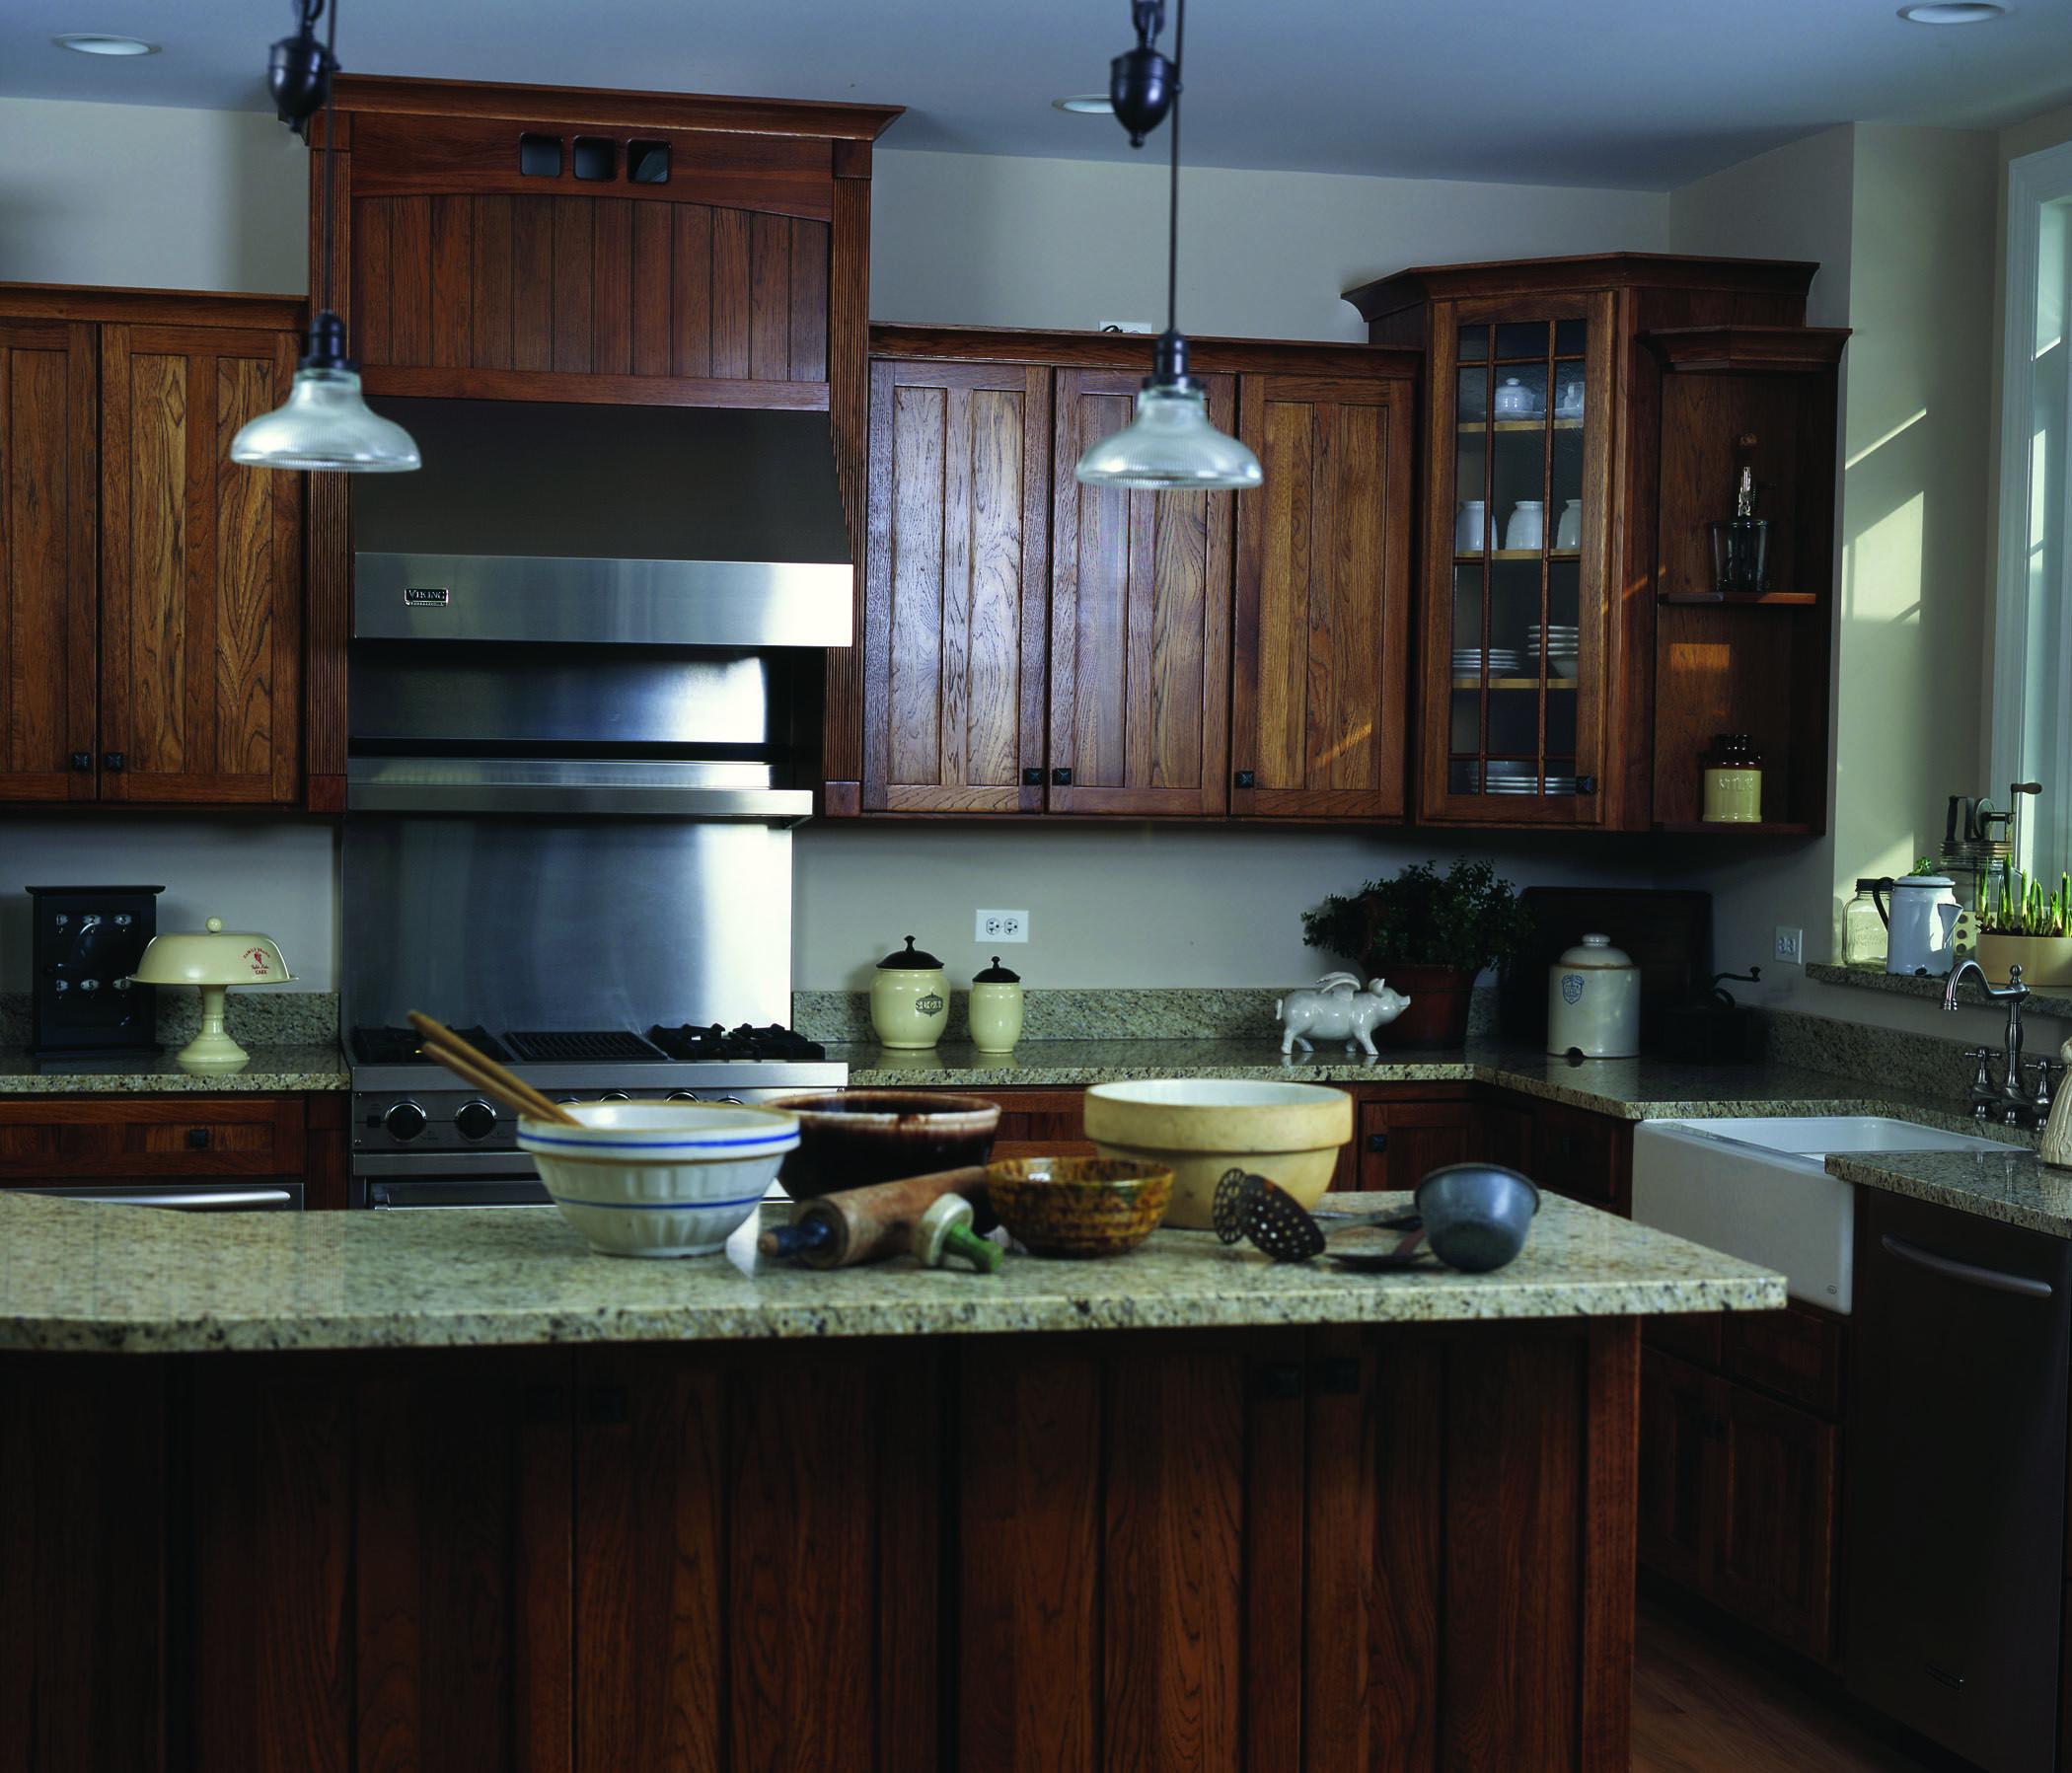 Door Style Mission V Wood Species Maple Finish Spice With Mocha Glaze C Haas Cabinet Cherry Cabinets Kitchen Kitchen Design Kitchen